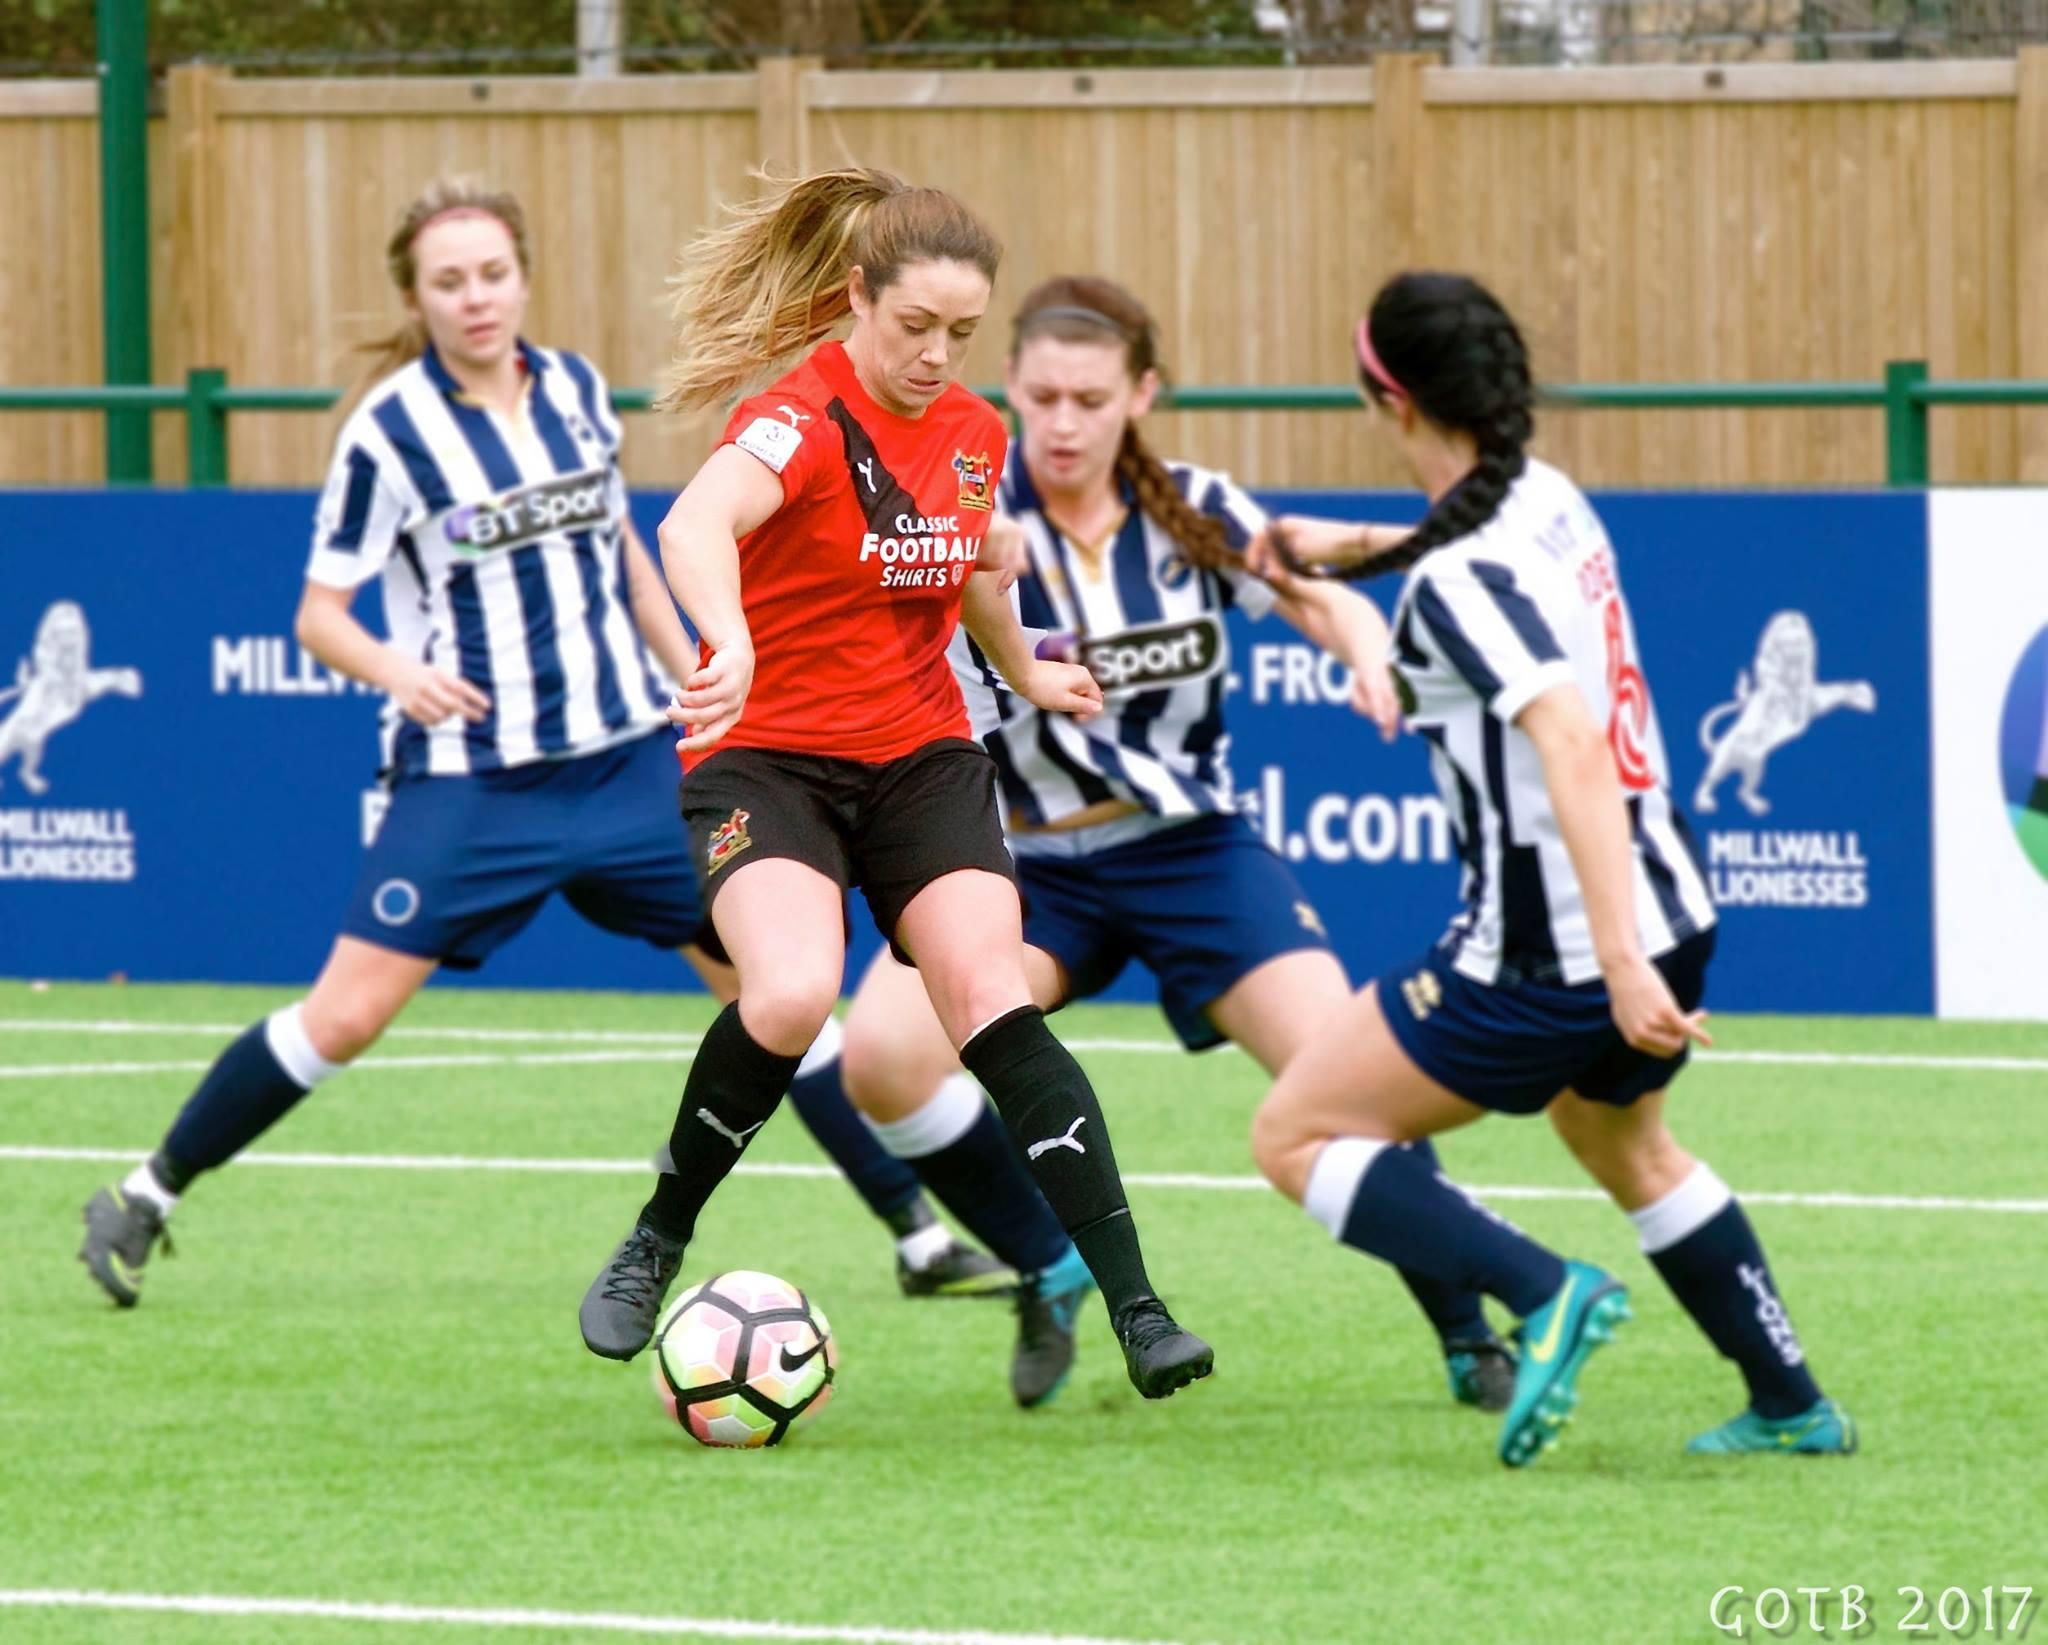 Millwall Lionesses v Sheffield FC, FAWSL 2